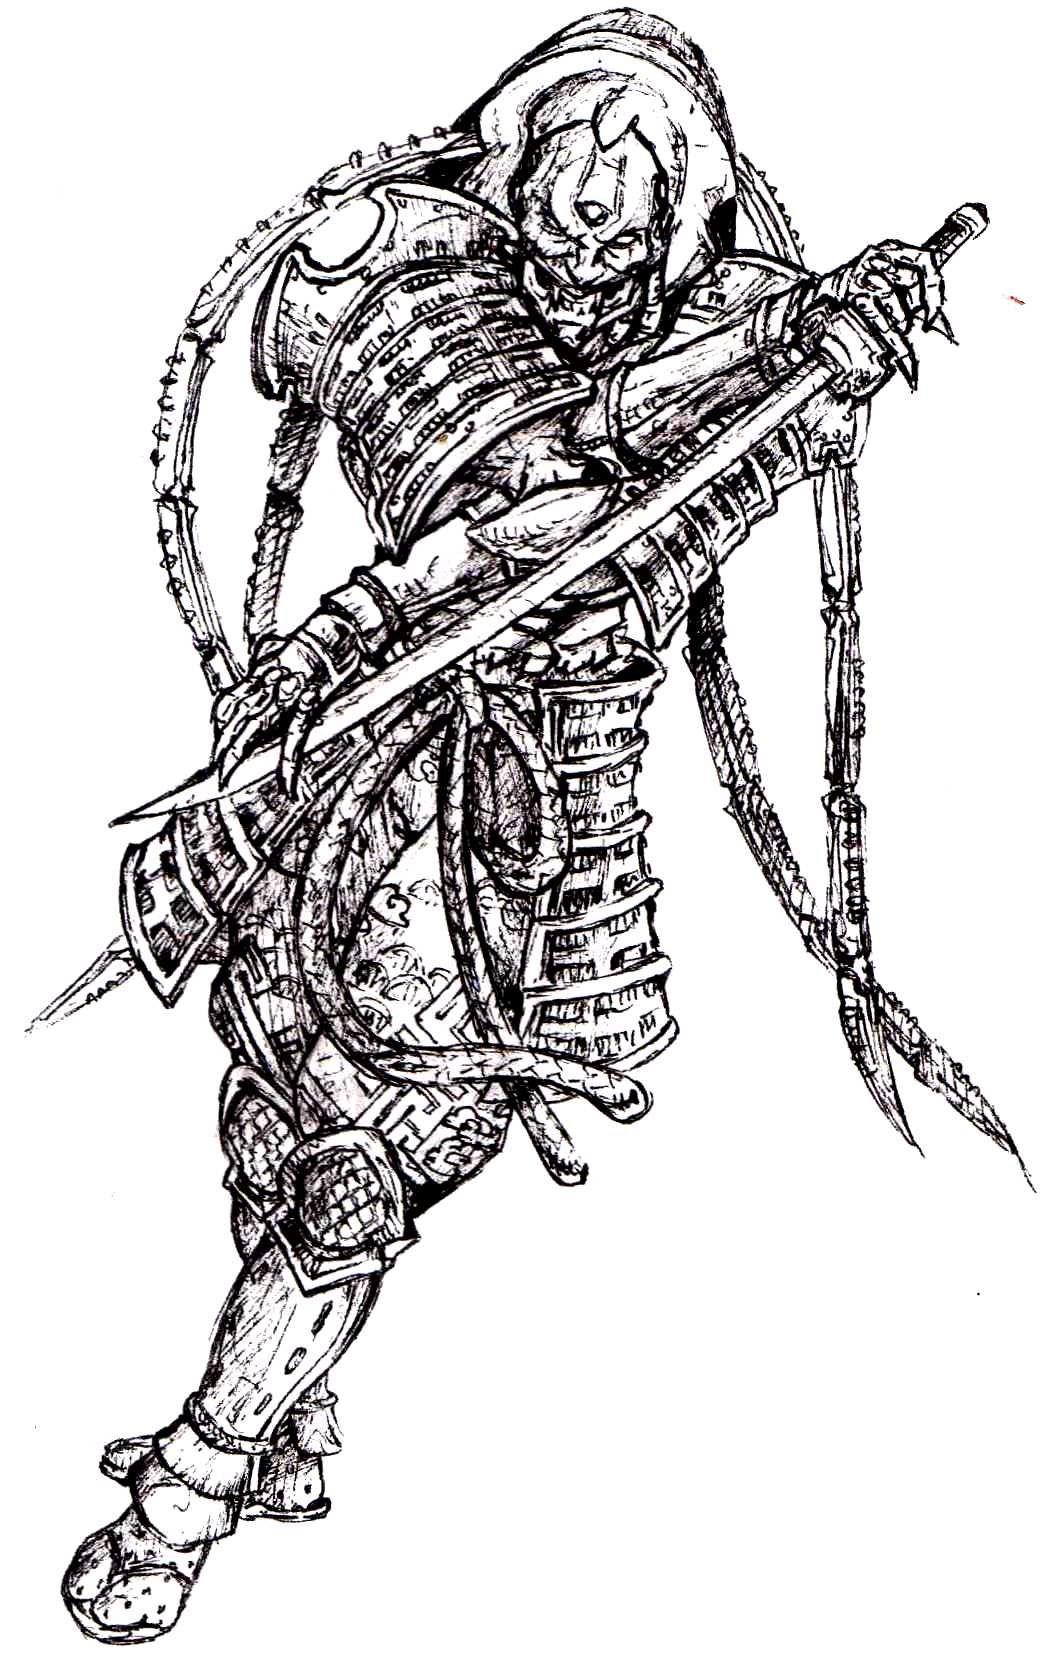 Yoshimitsu Character Design : Yoshimitsu sketch by japantuning pinterest